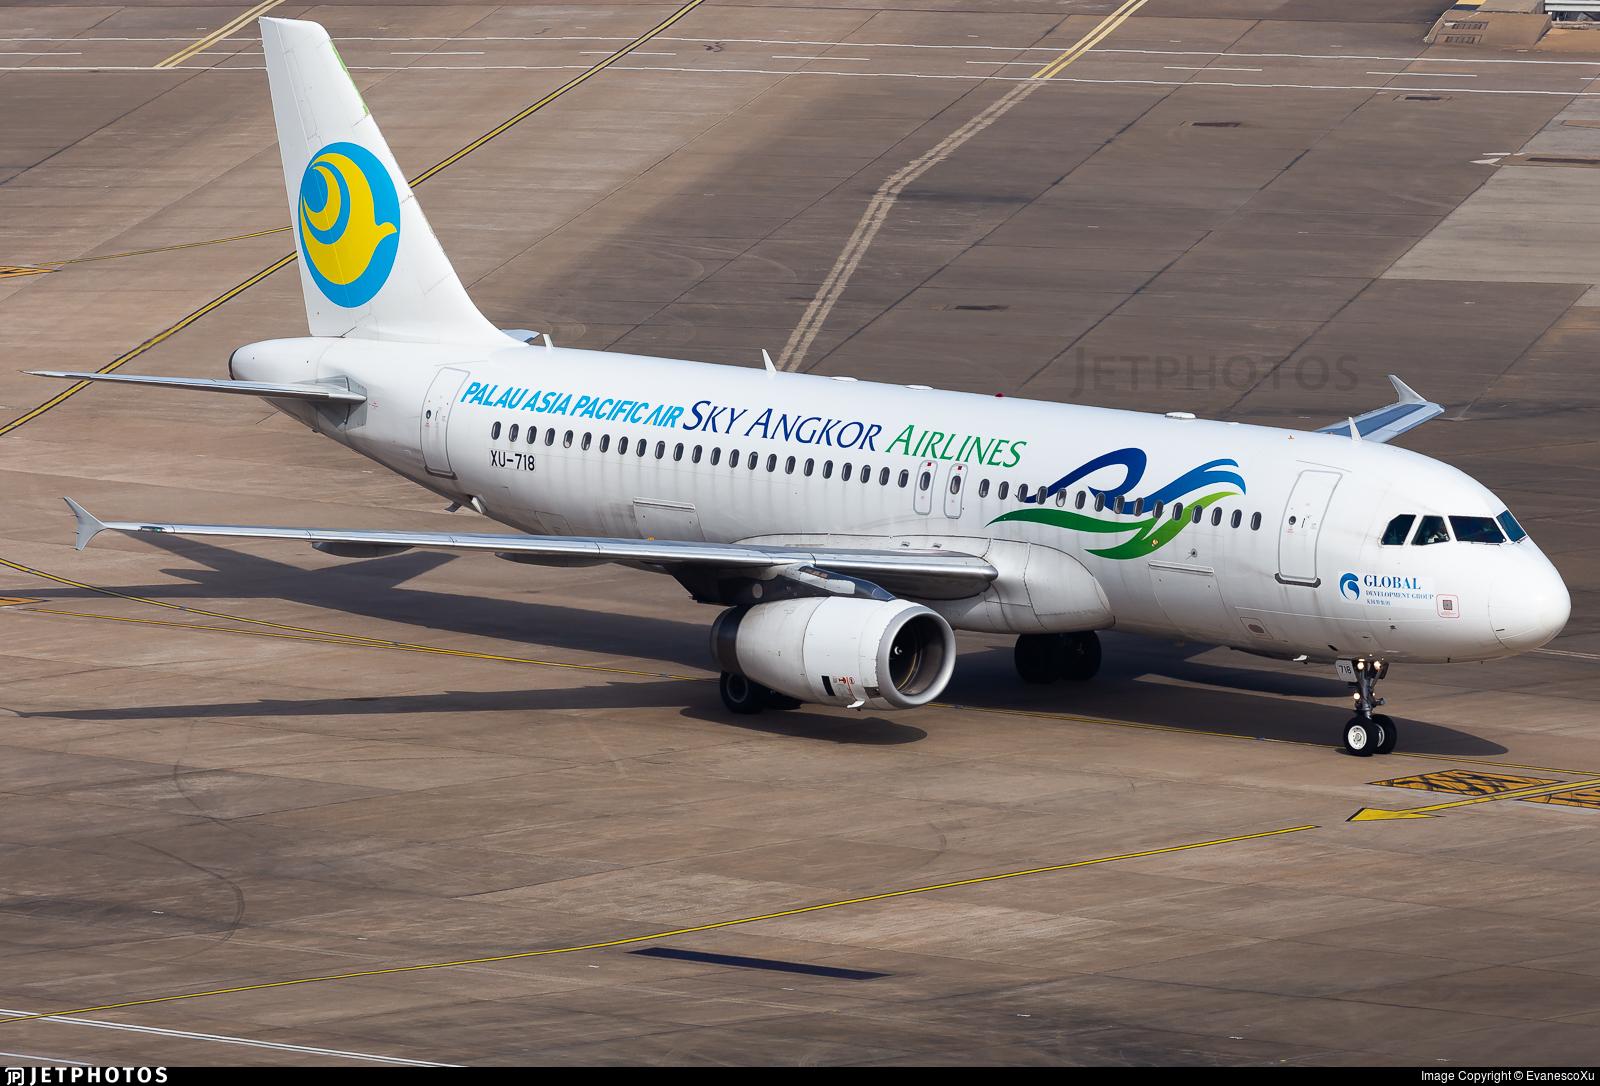 XU-718 - Airbus A320-232 - Sky Angkor Airlines